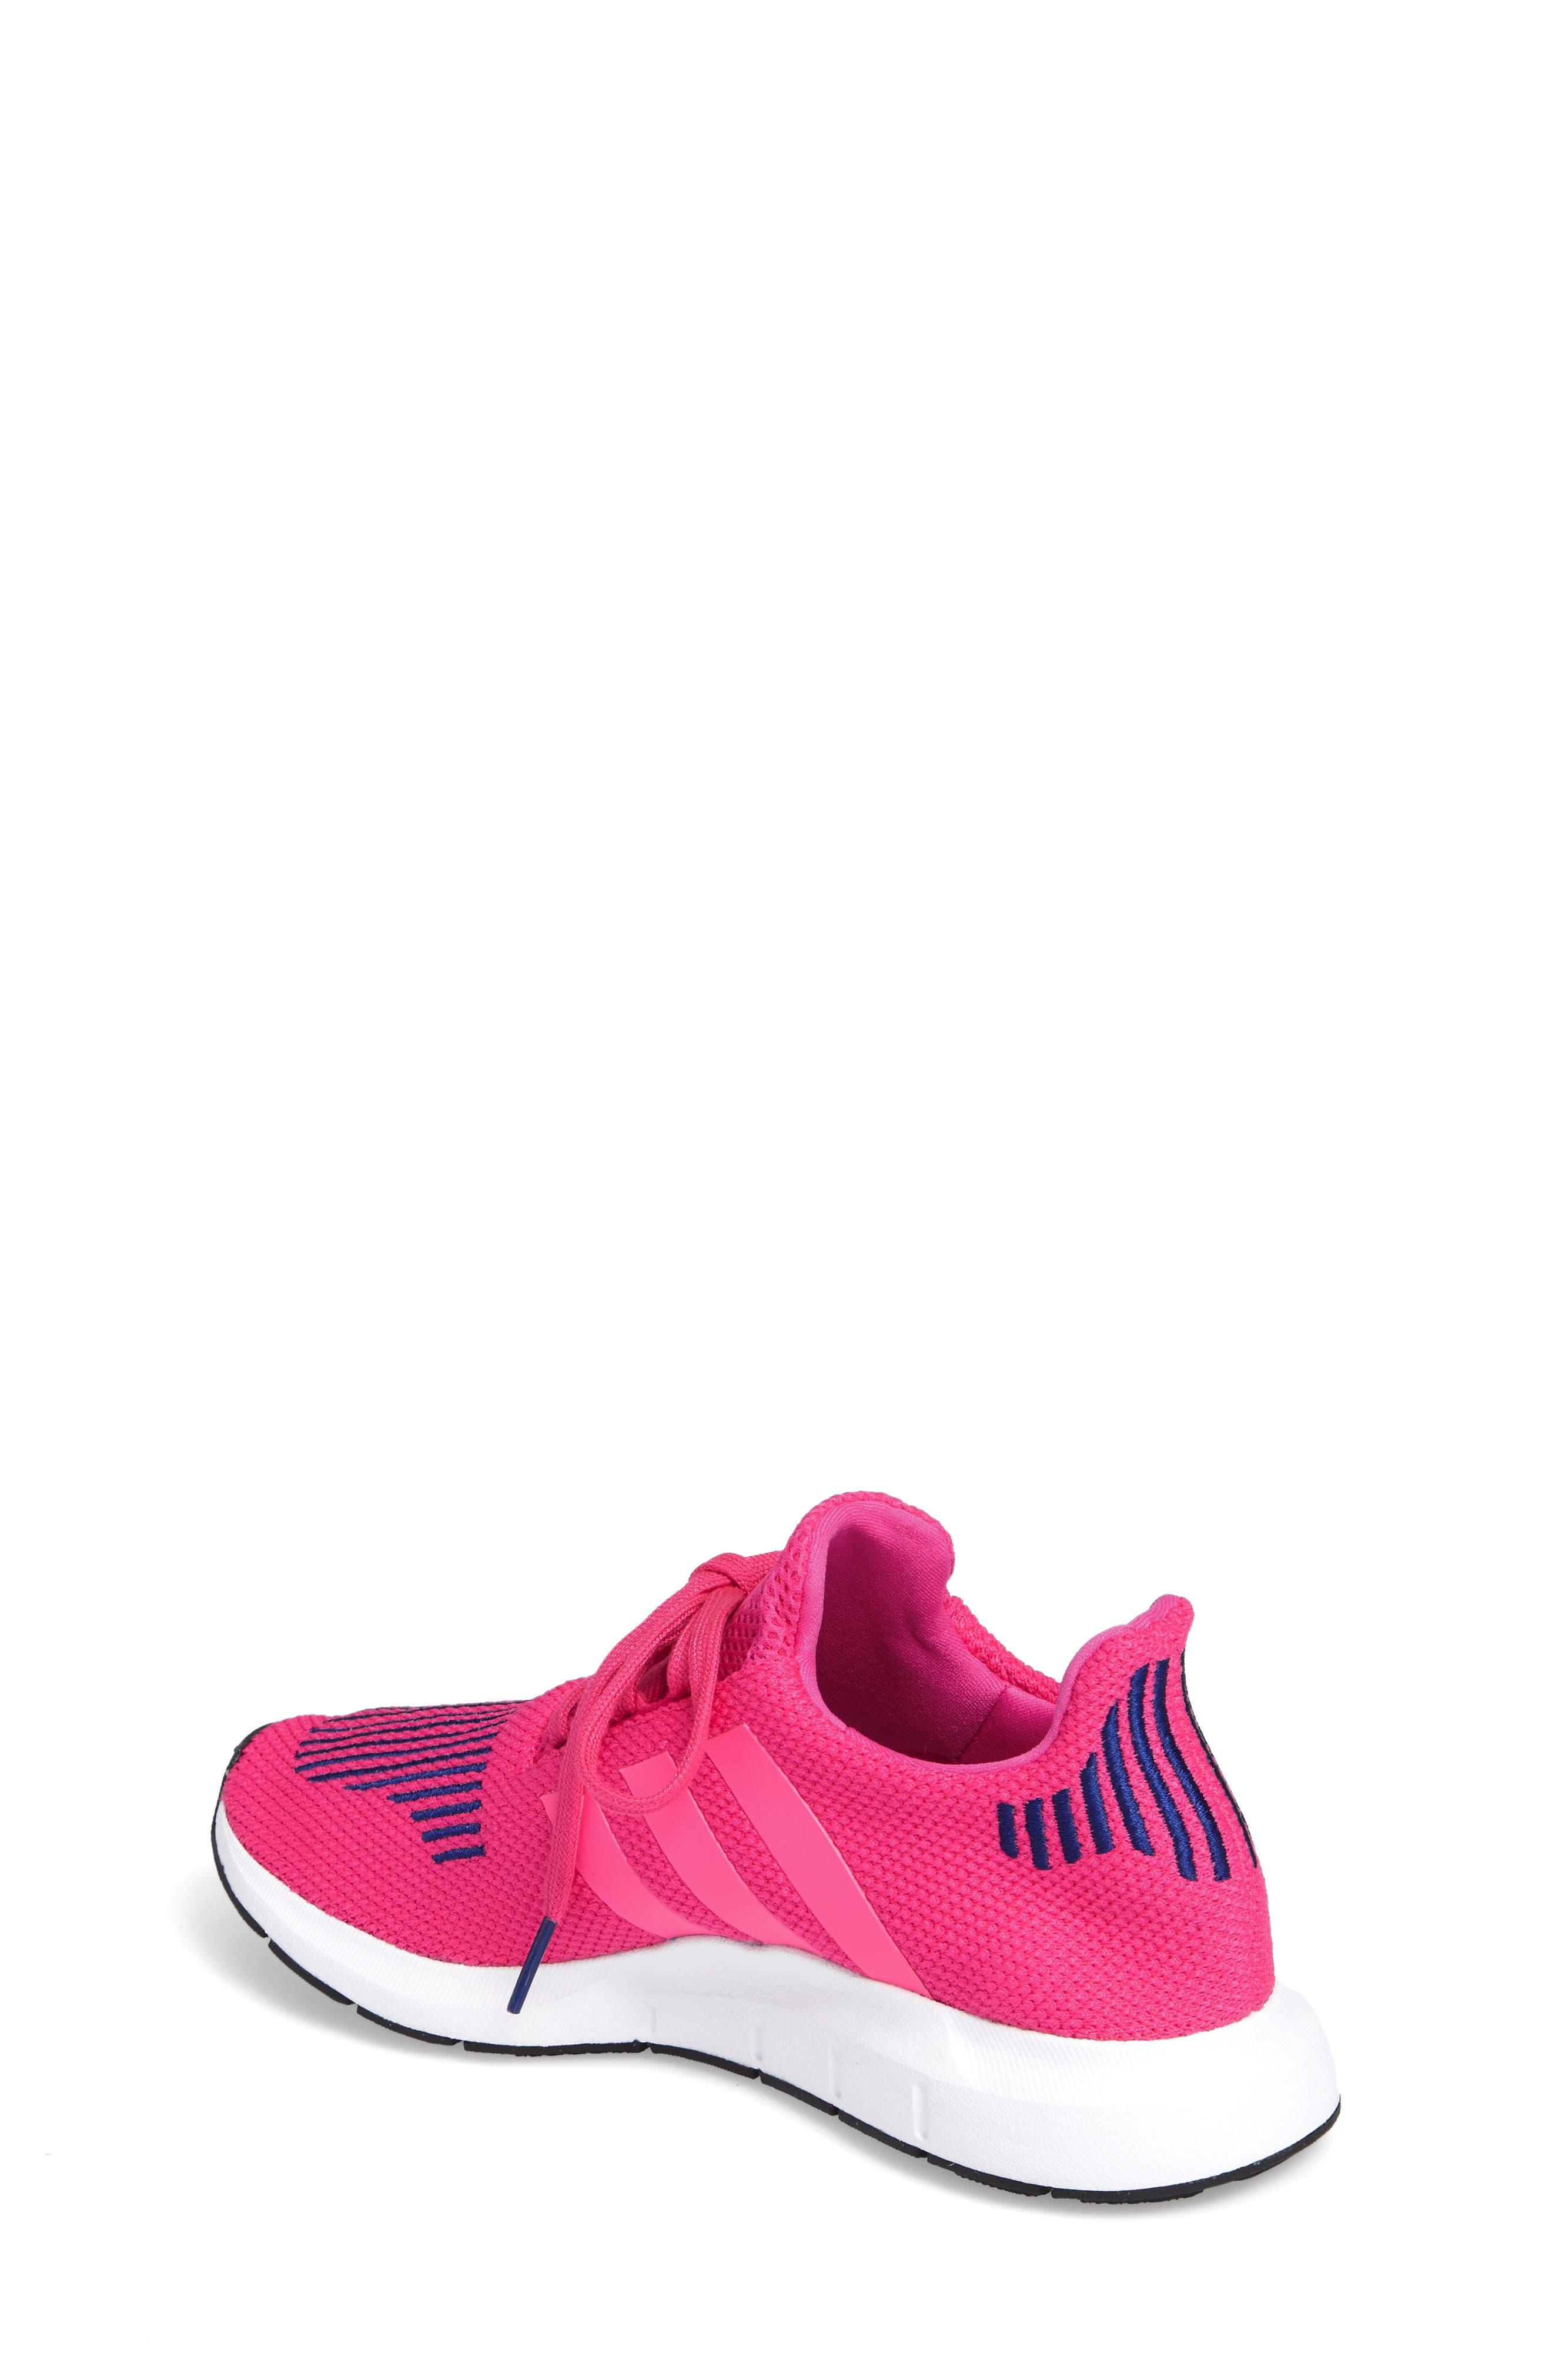 Swift Run Sock Knit Sneaker,                             Alternate thumbnail 2, color,                             672